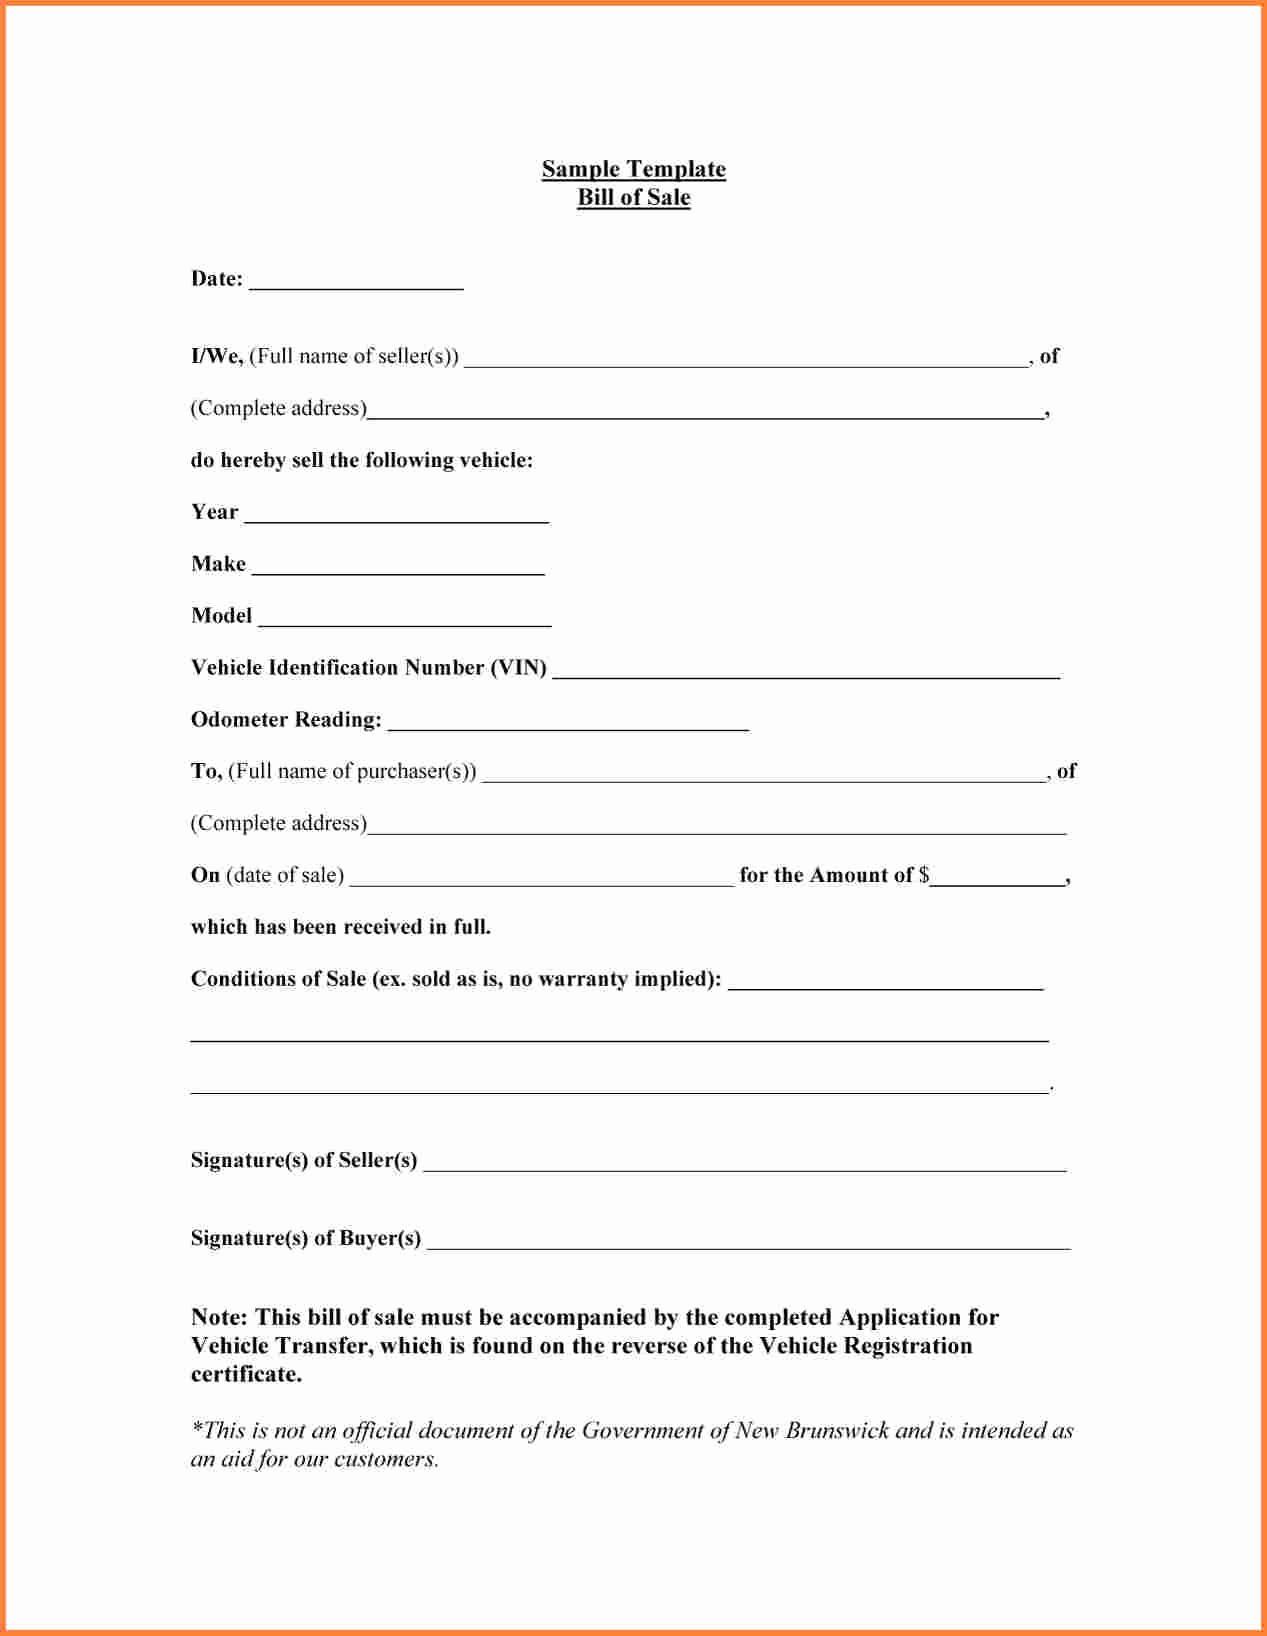 Bill Of Sale Car Sample Lovely Sample Bill Of Sale form for Car Printable